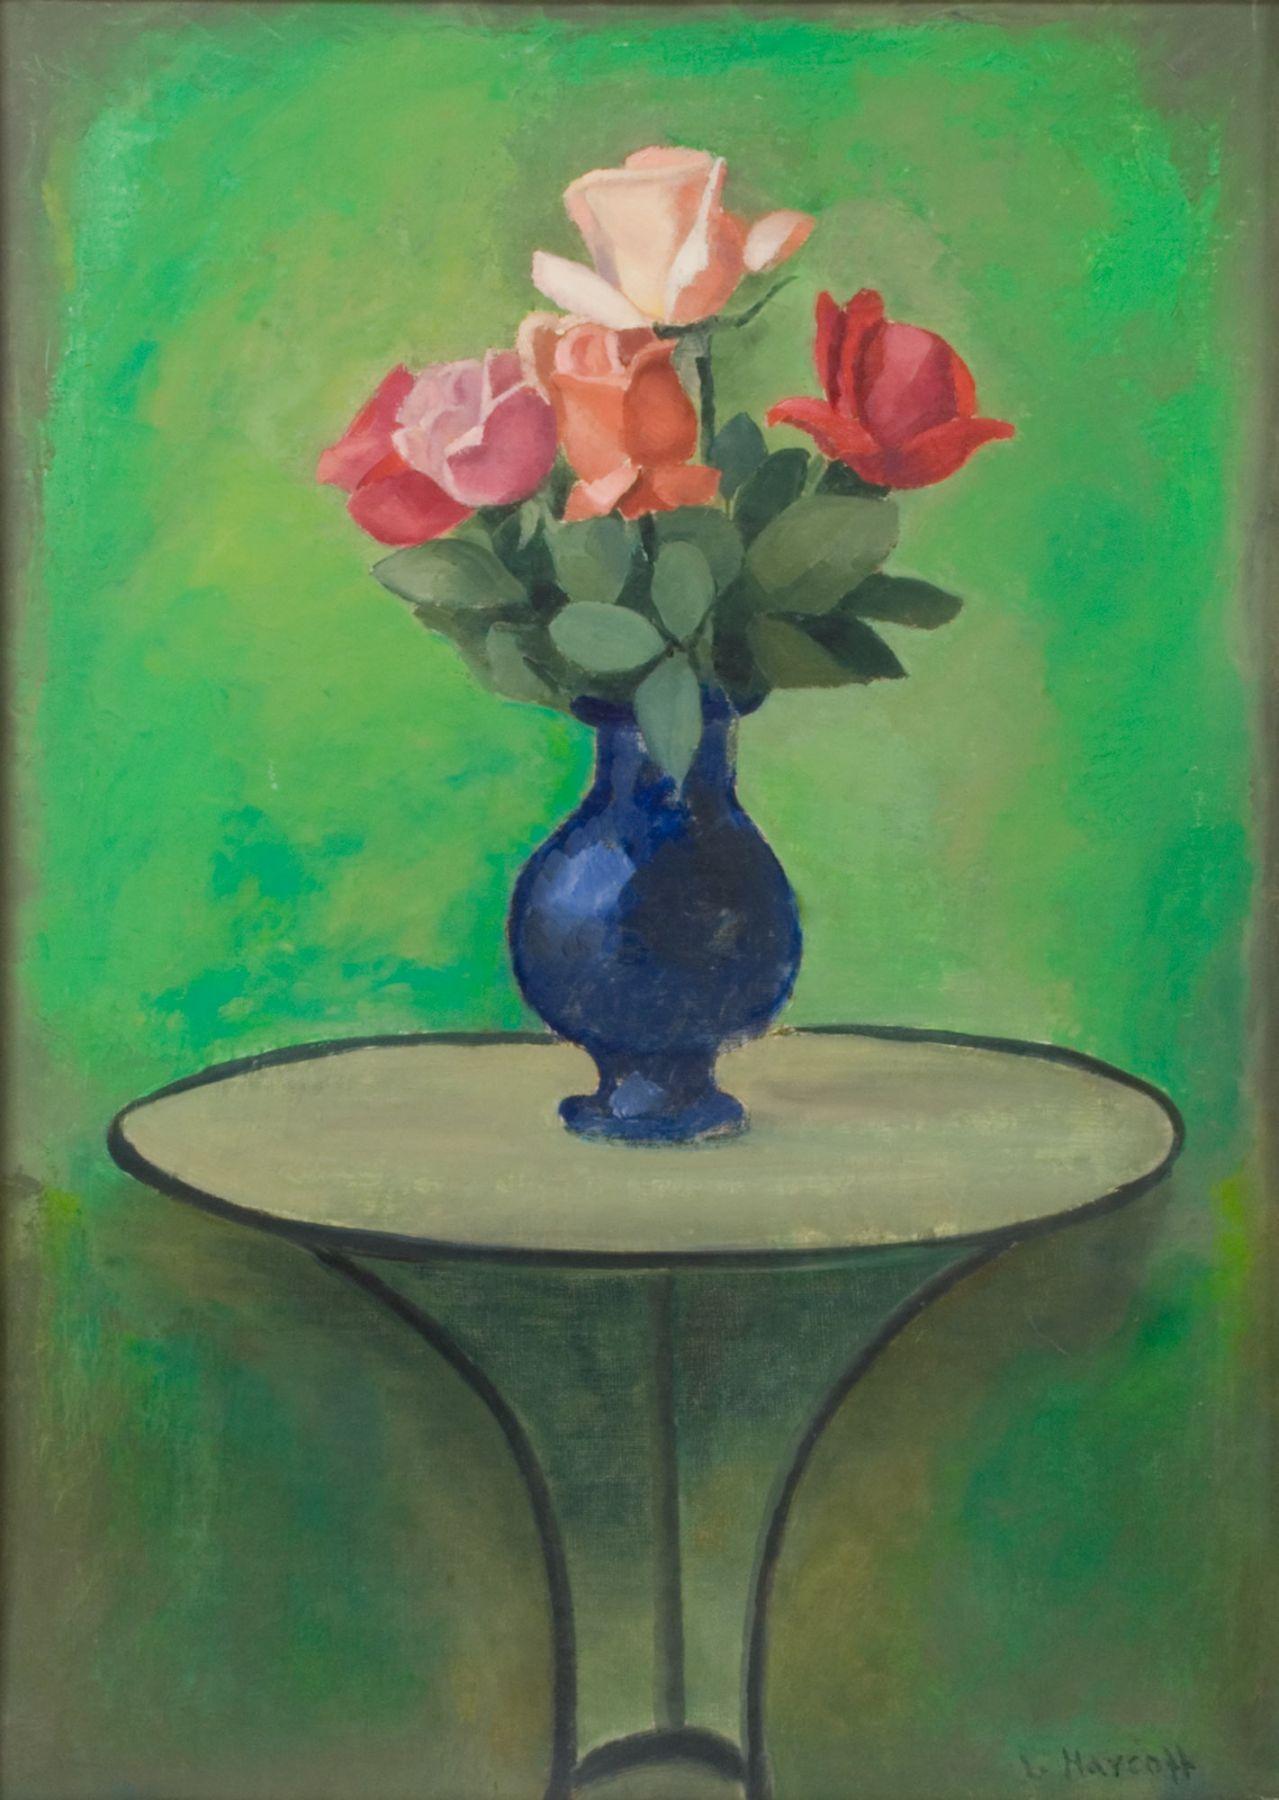 Lyla Marshall Harcoff, Five Roses